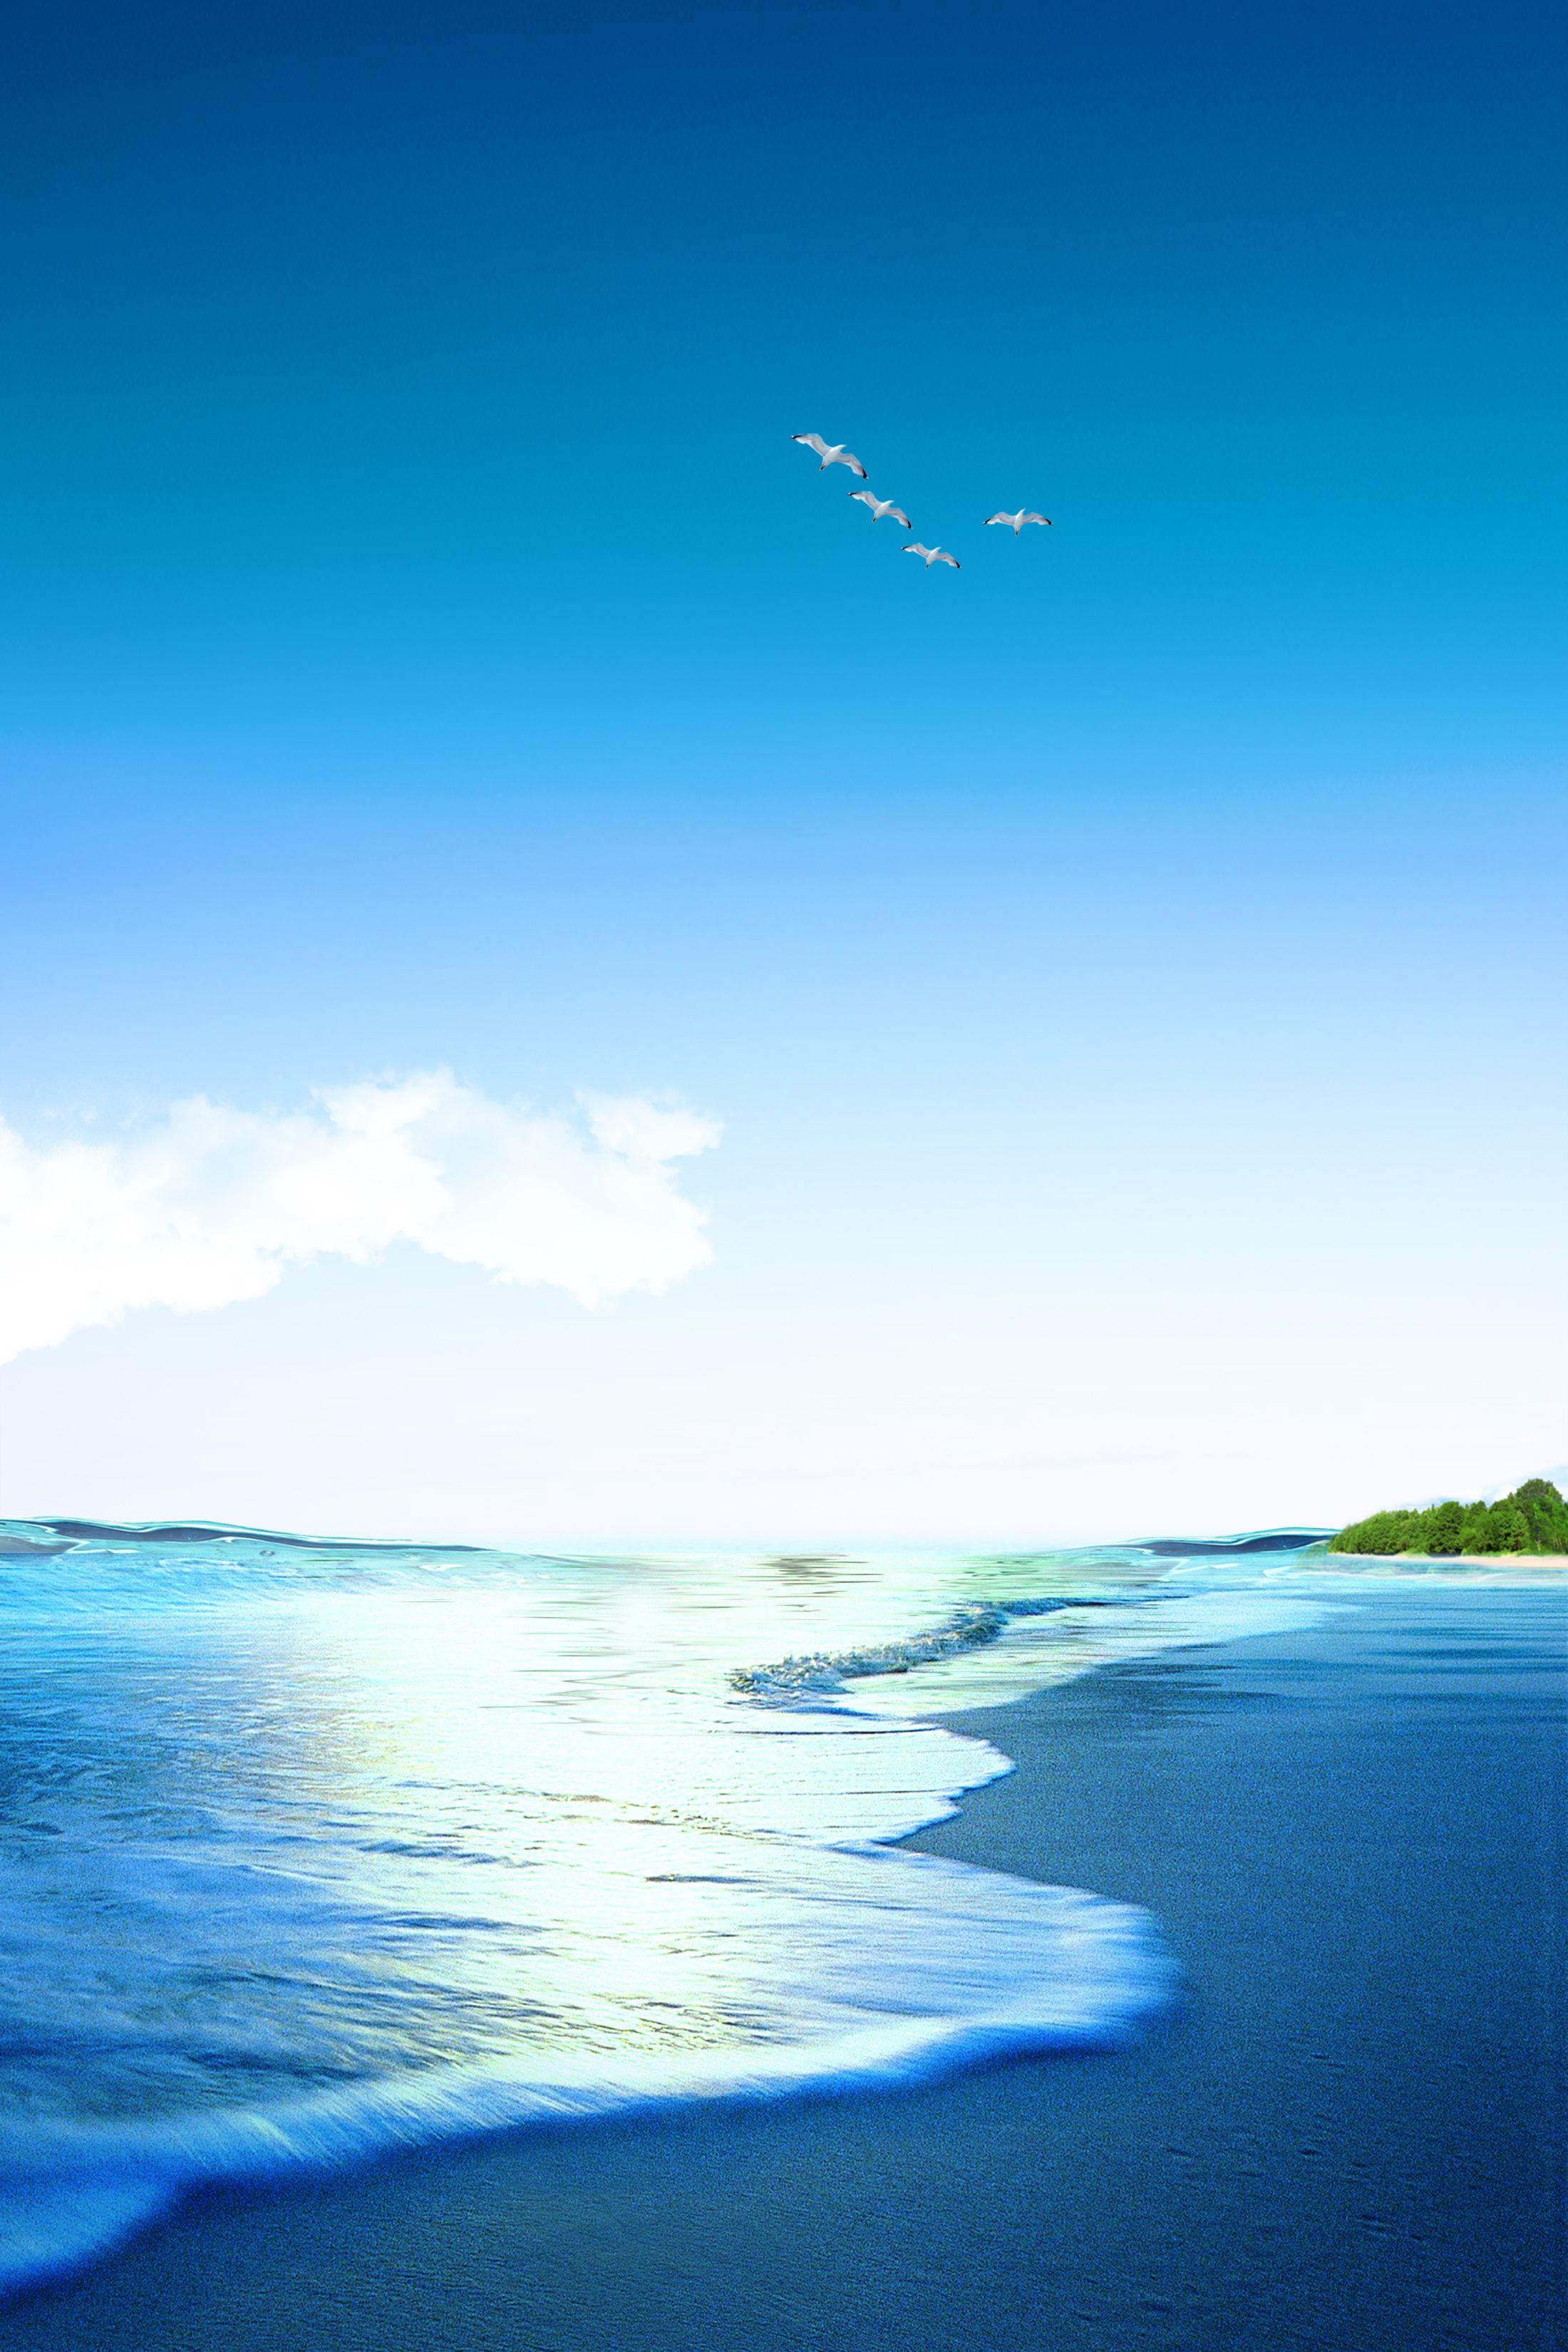 خلفية بحر هادئ Natural Landmarks Ocean Background